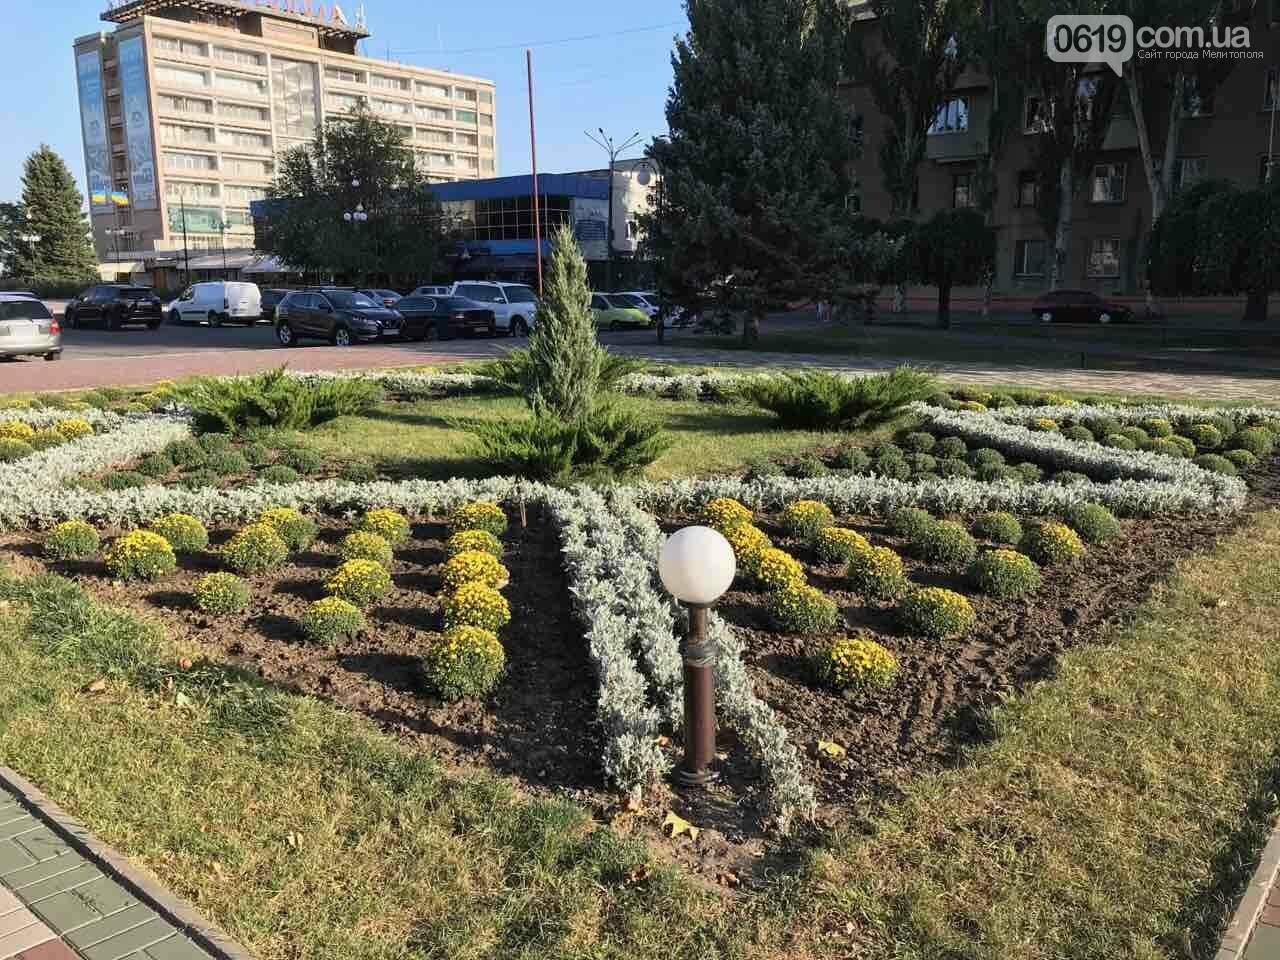 Центральная площадь Мелитополя заиграла новыми красками , фото-1